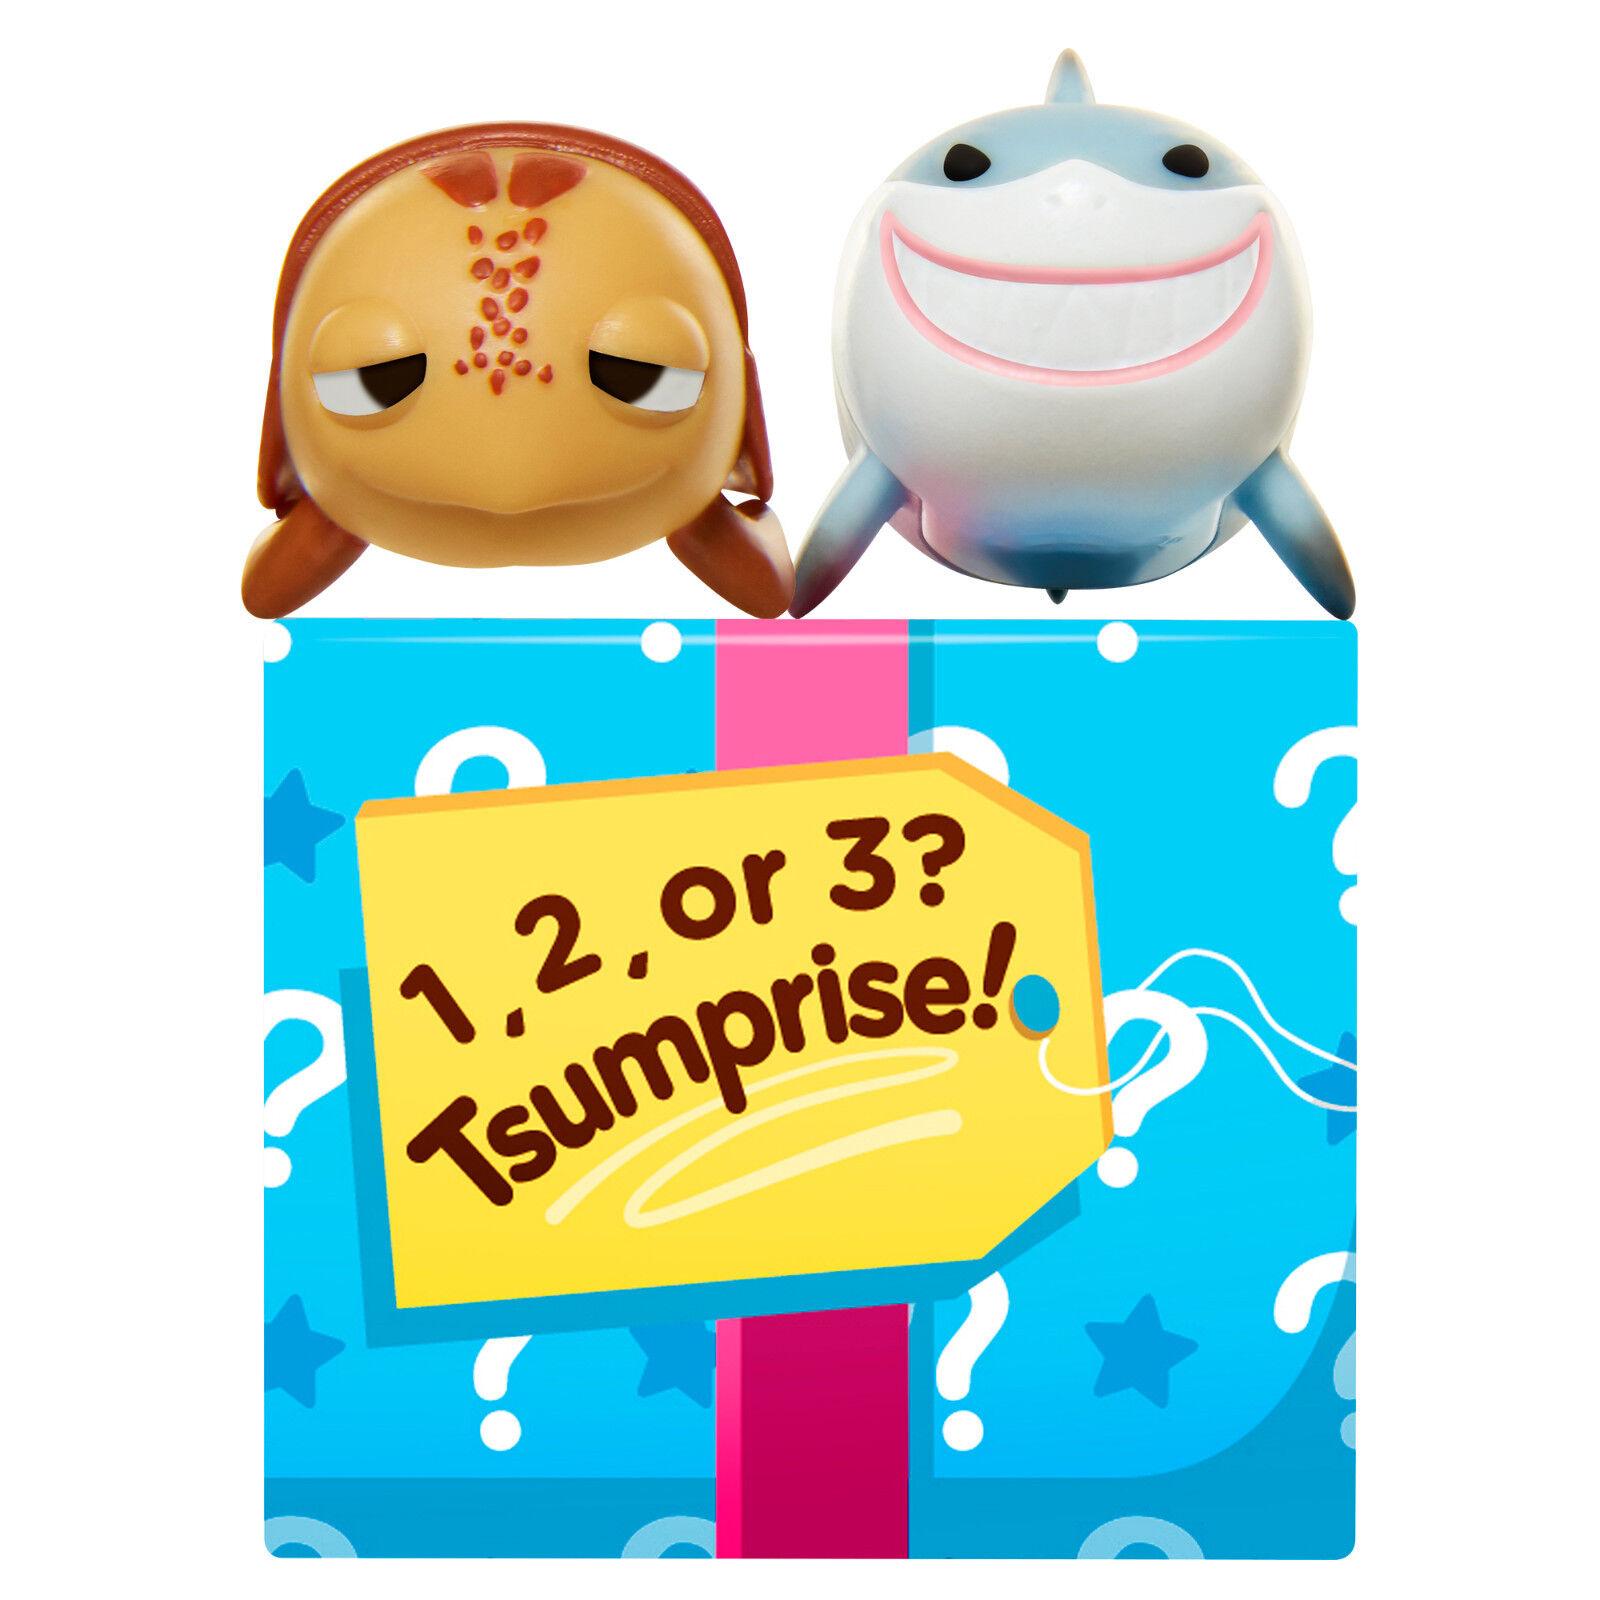 Disney Tsum Tsum Series 7 Style #3 - Crush/Bruce/Tsumprise